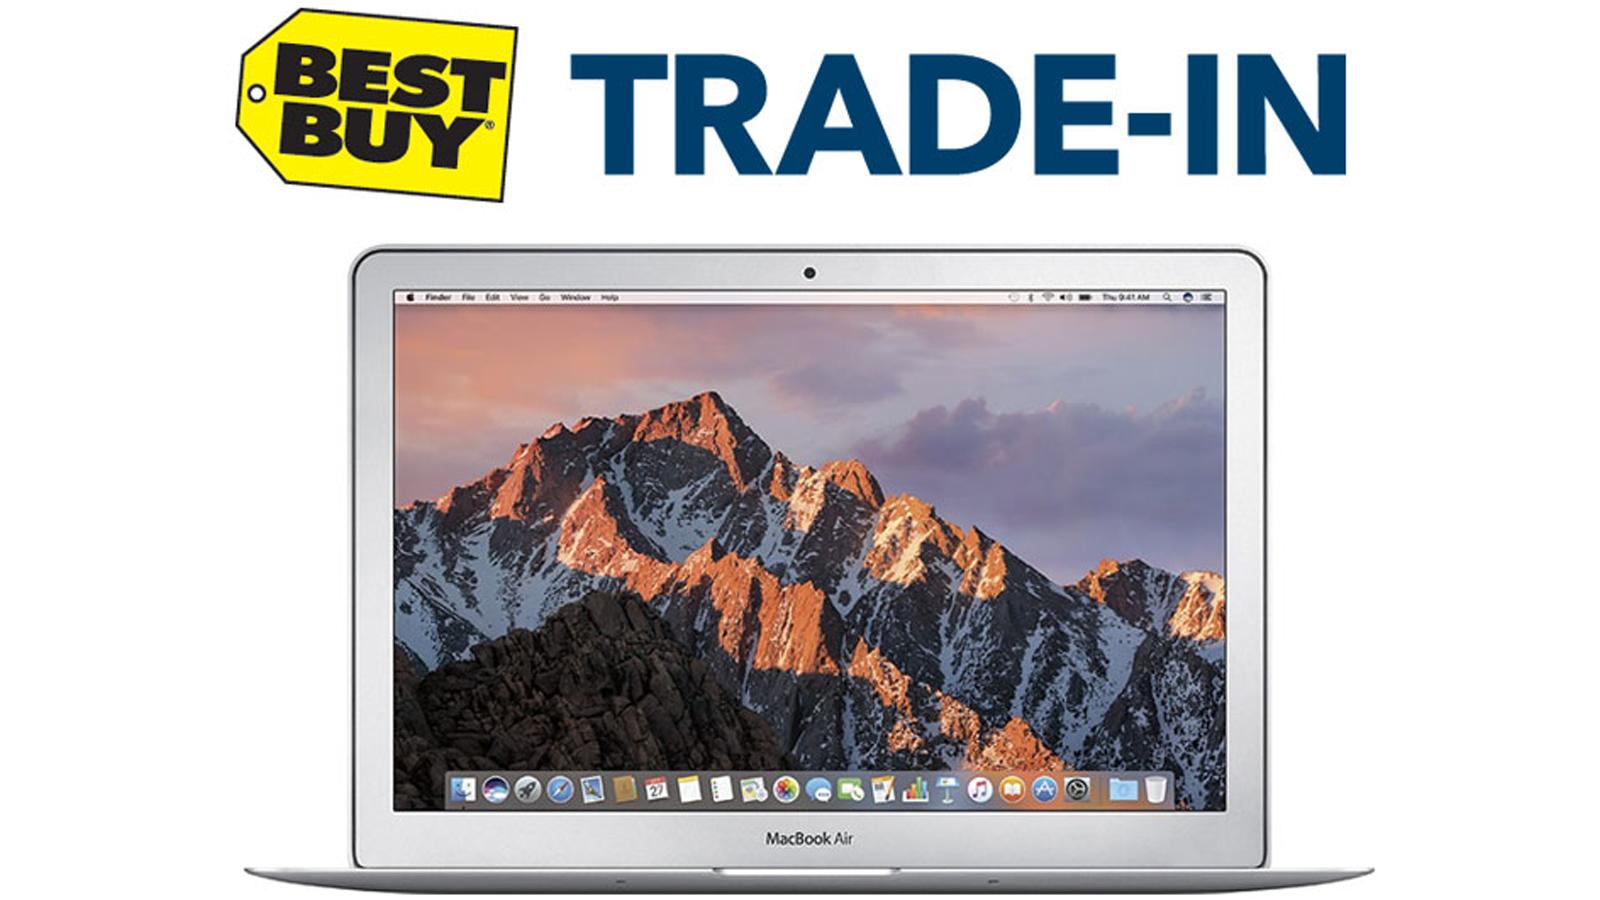 Best Buy Trade In program with picture of MacBook